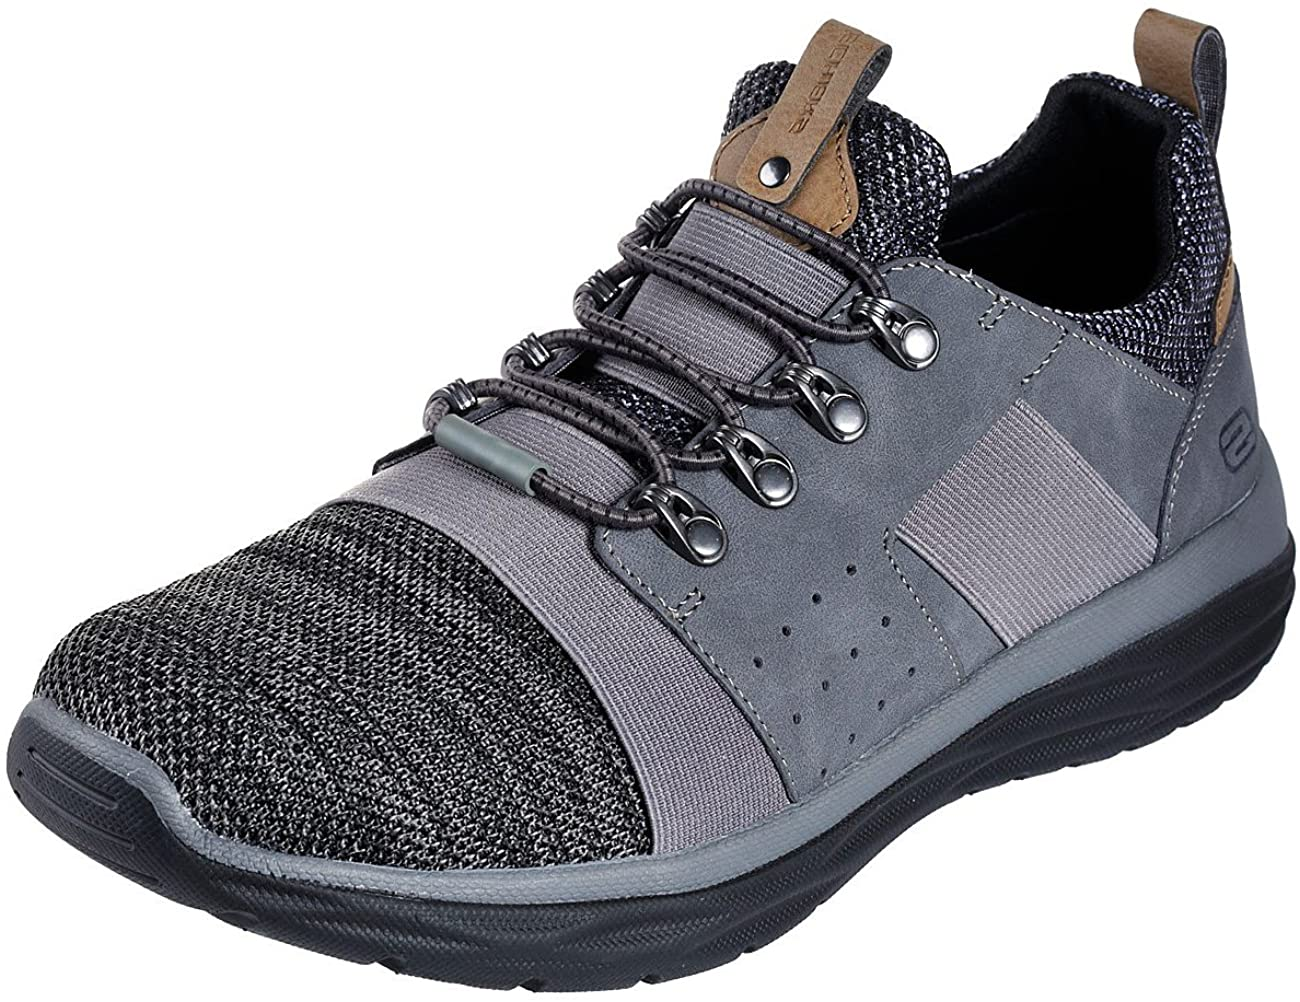 Skechers 65607 Men's Harsen-Arsego Sneaker, Charcoal - 11 D(M) US